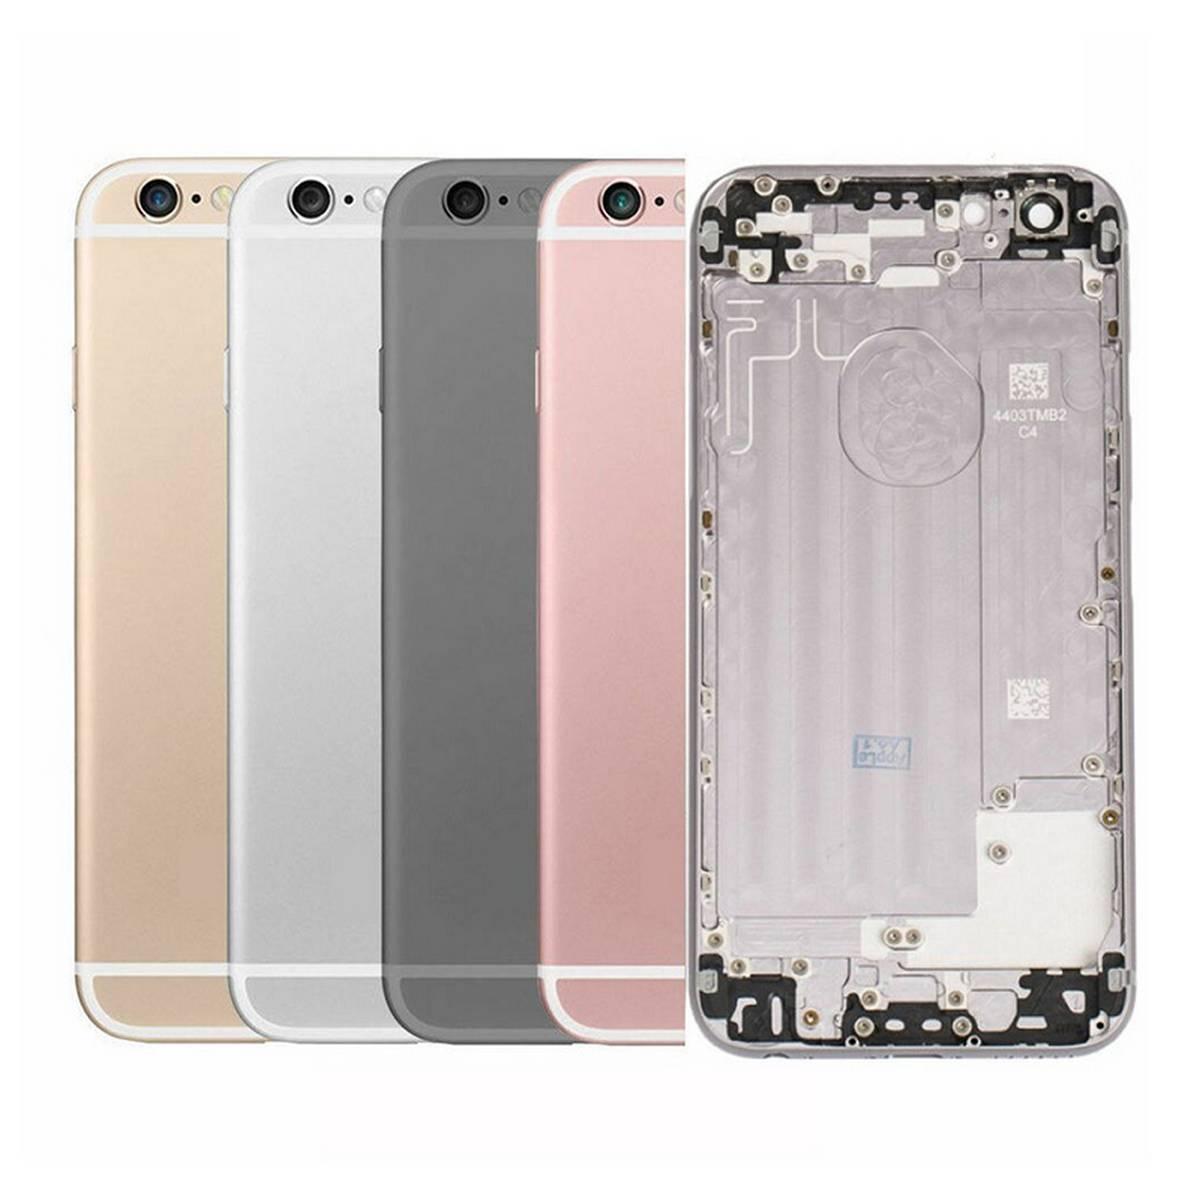 iPhone 6 Plus Housing Body Case - Grade A+